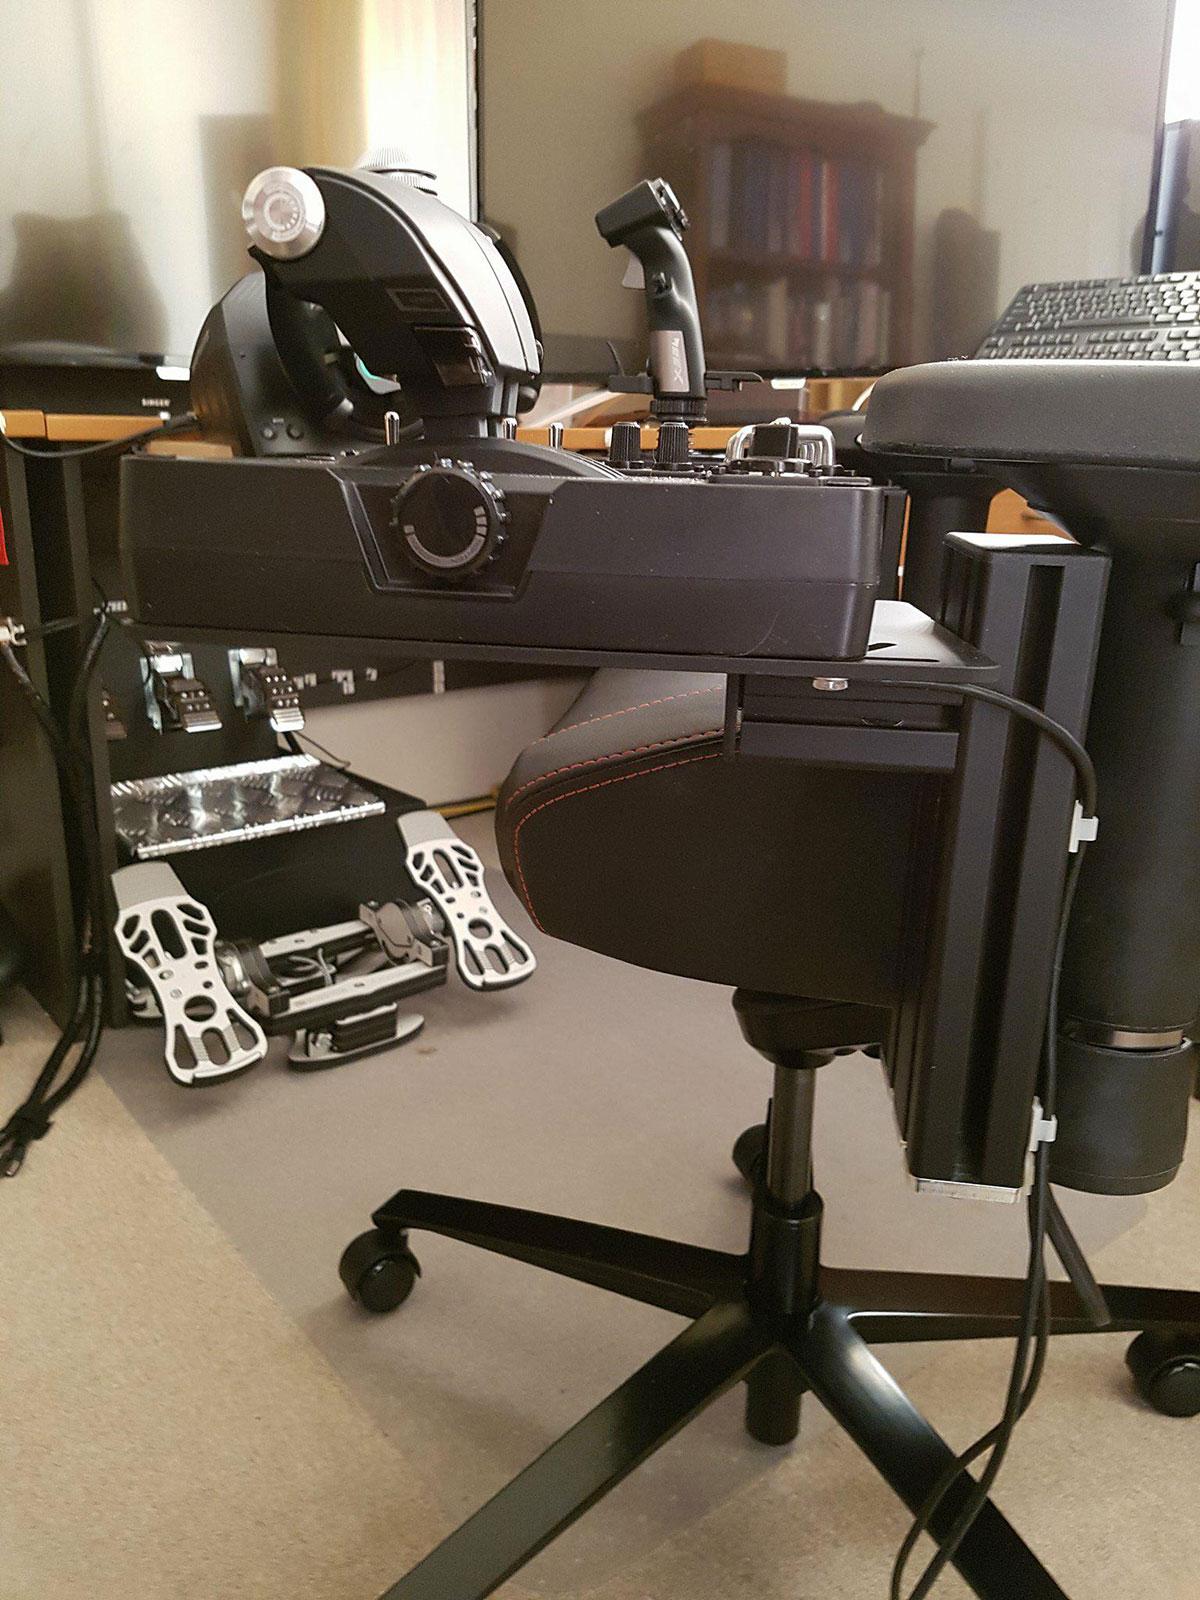 office chair joystick mount pontoon boat captain hotas monstertech customer images